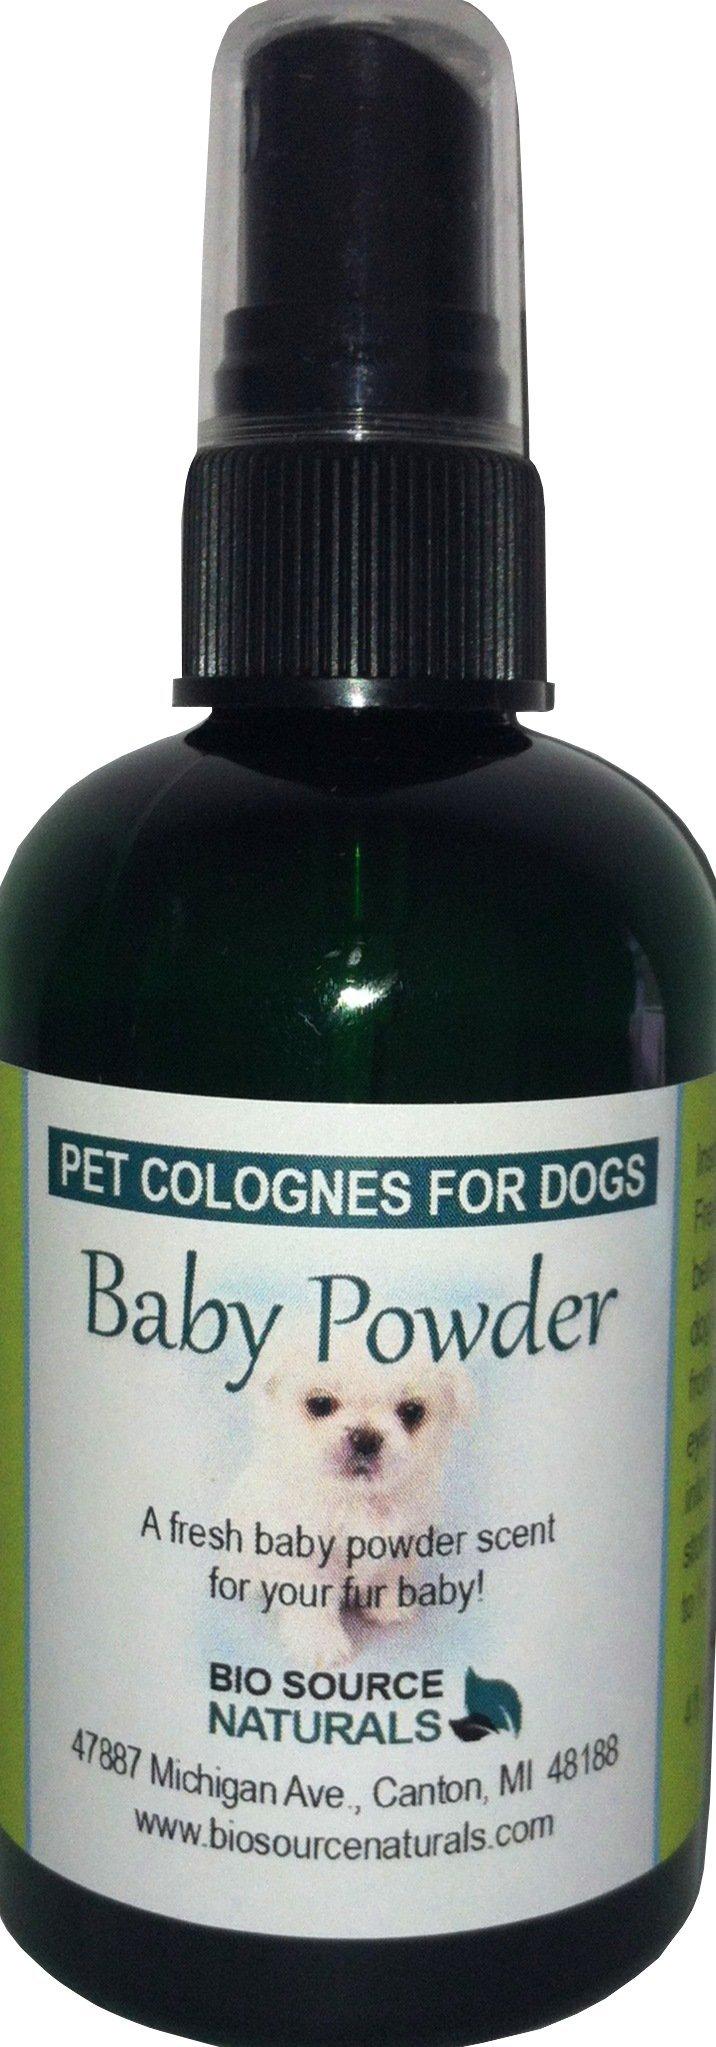 Baby Powder Pet - Dog Cologne Spray (4 Oz/ 120 Ml)